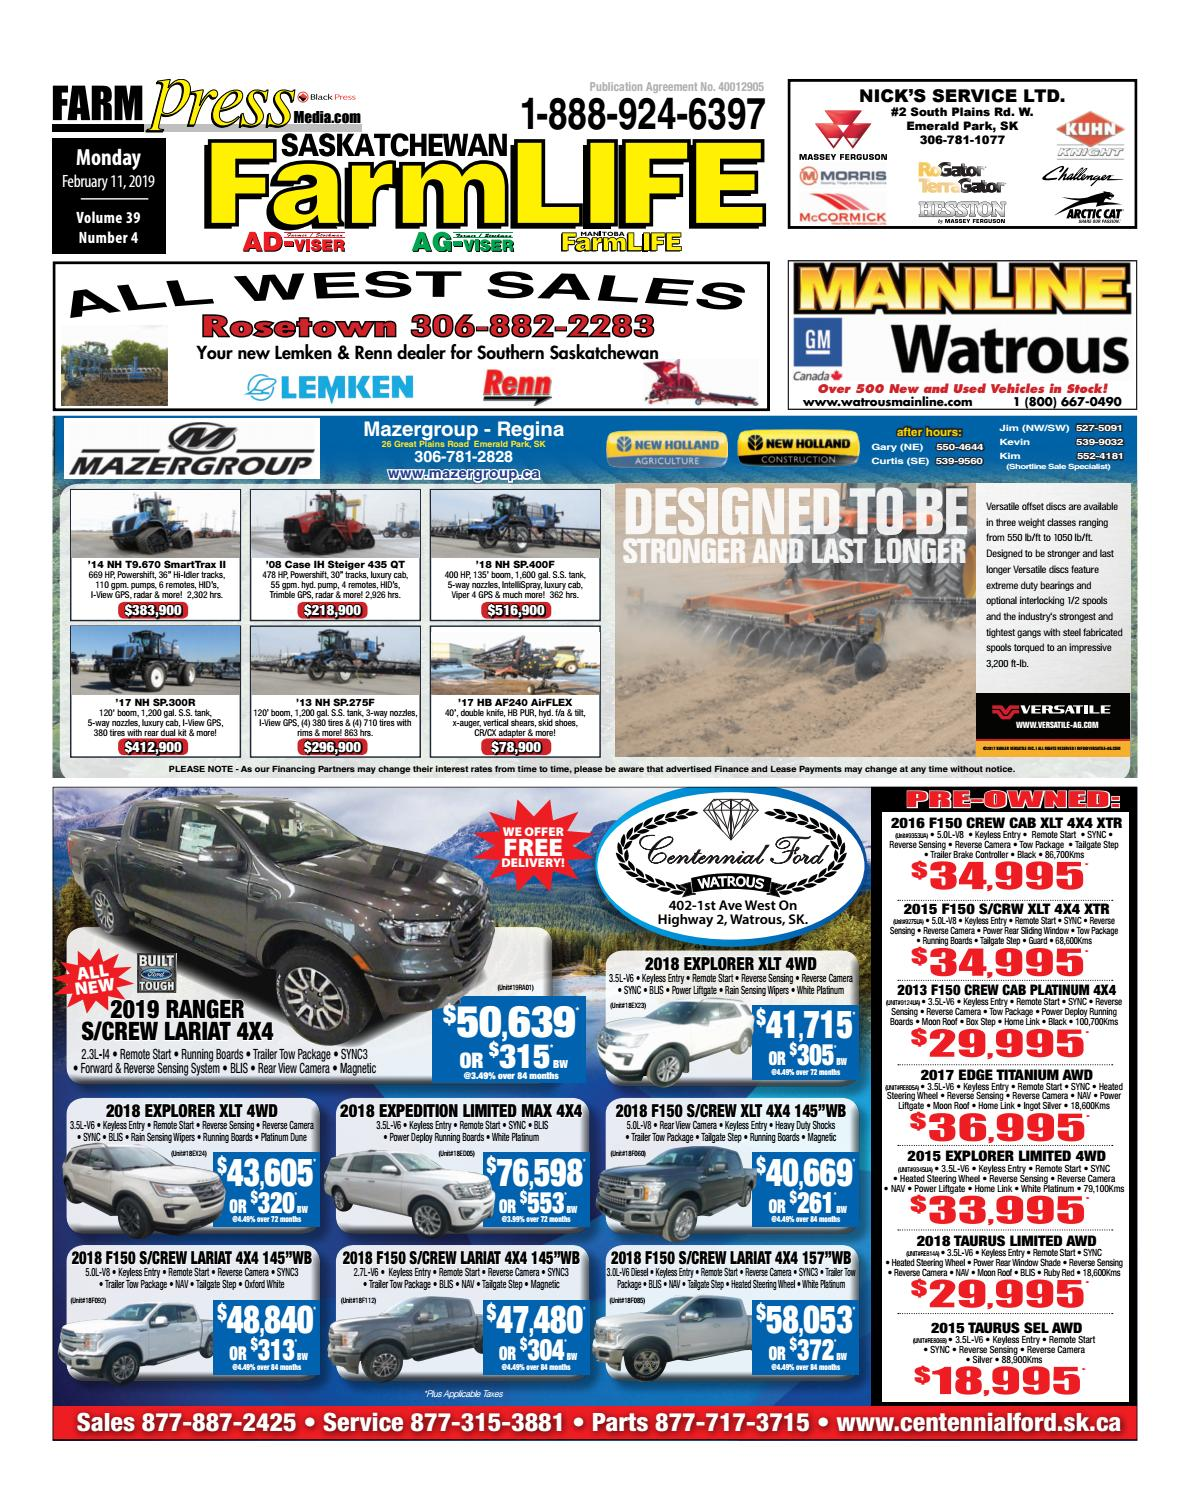 Saskatchewan Farm Life, February 11, 2019 by Black Press